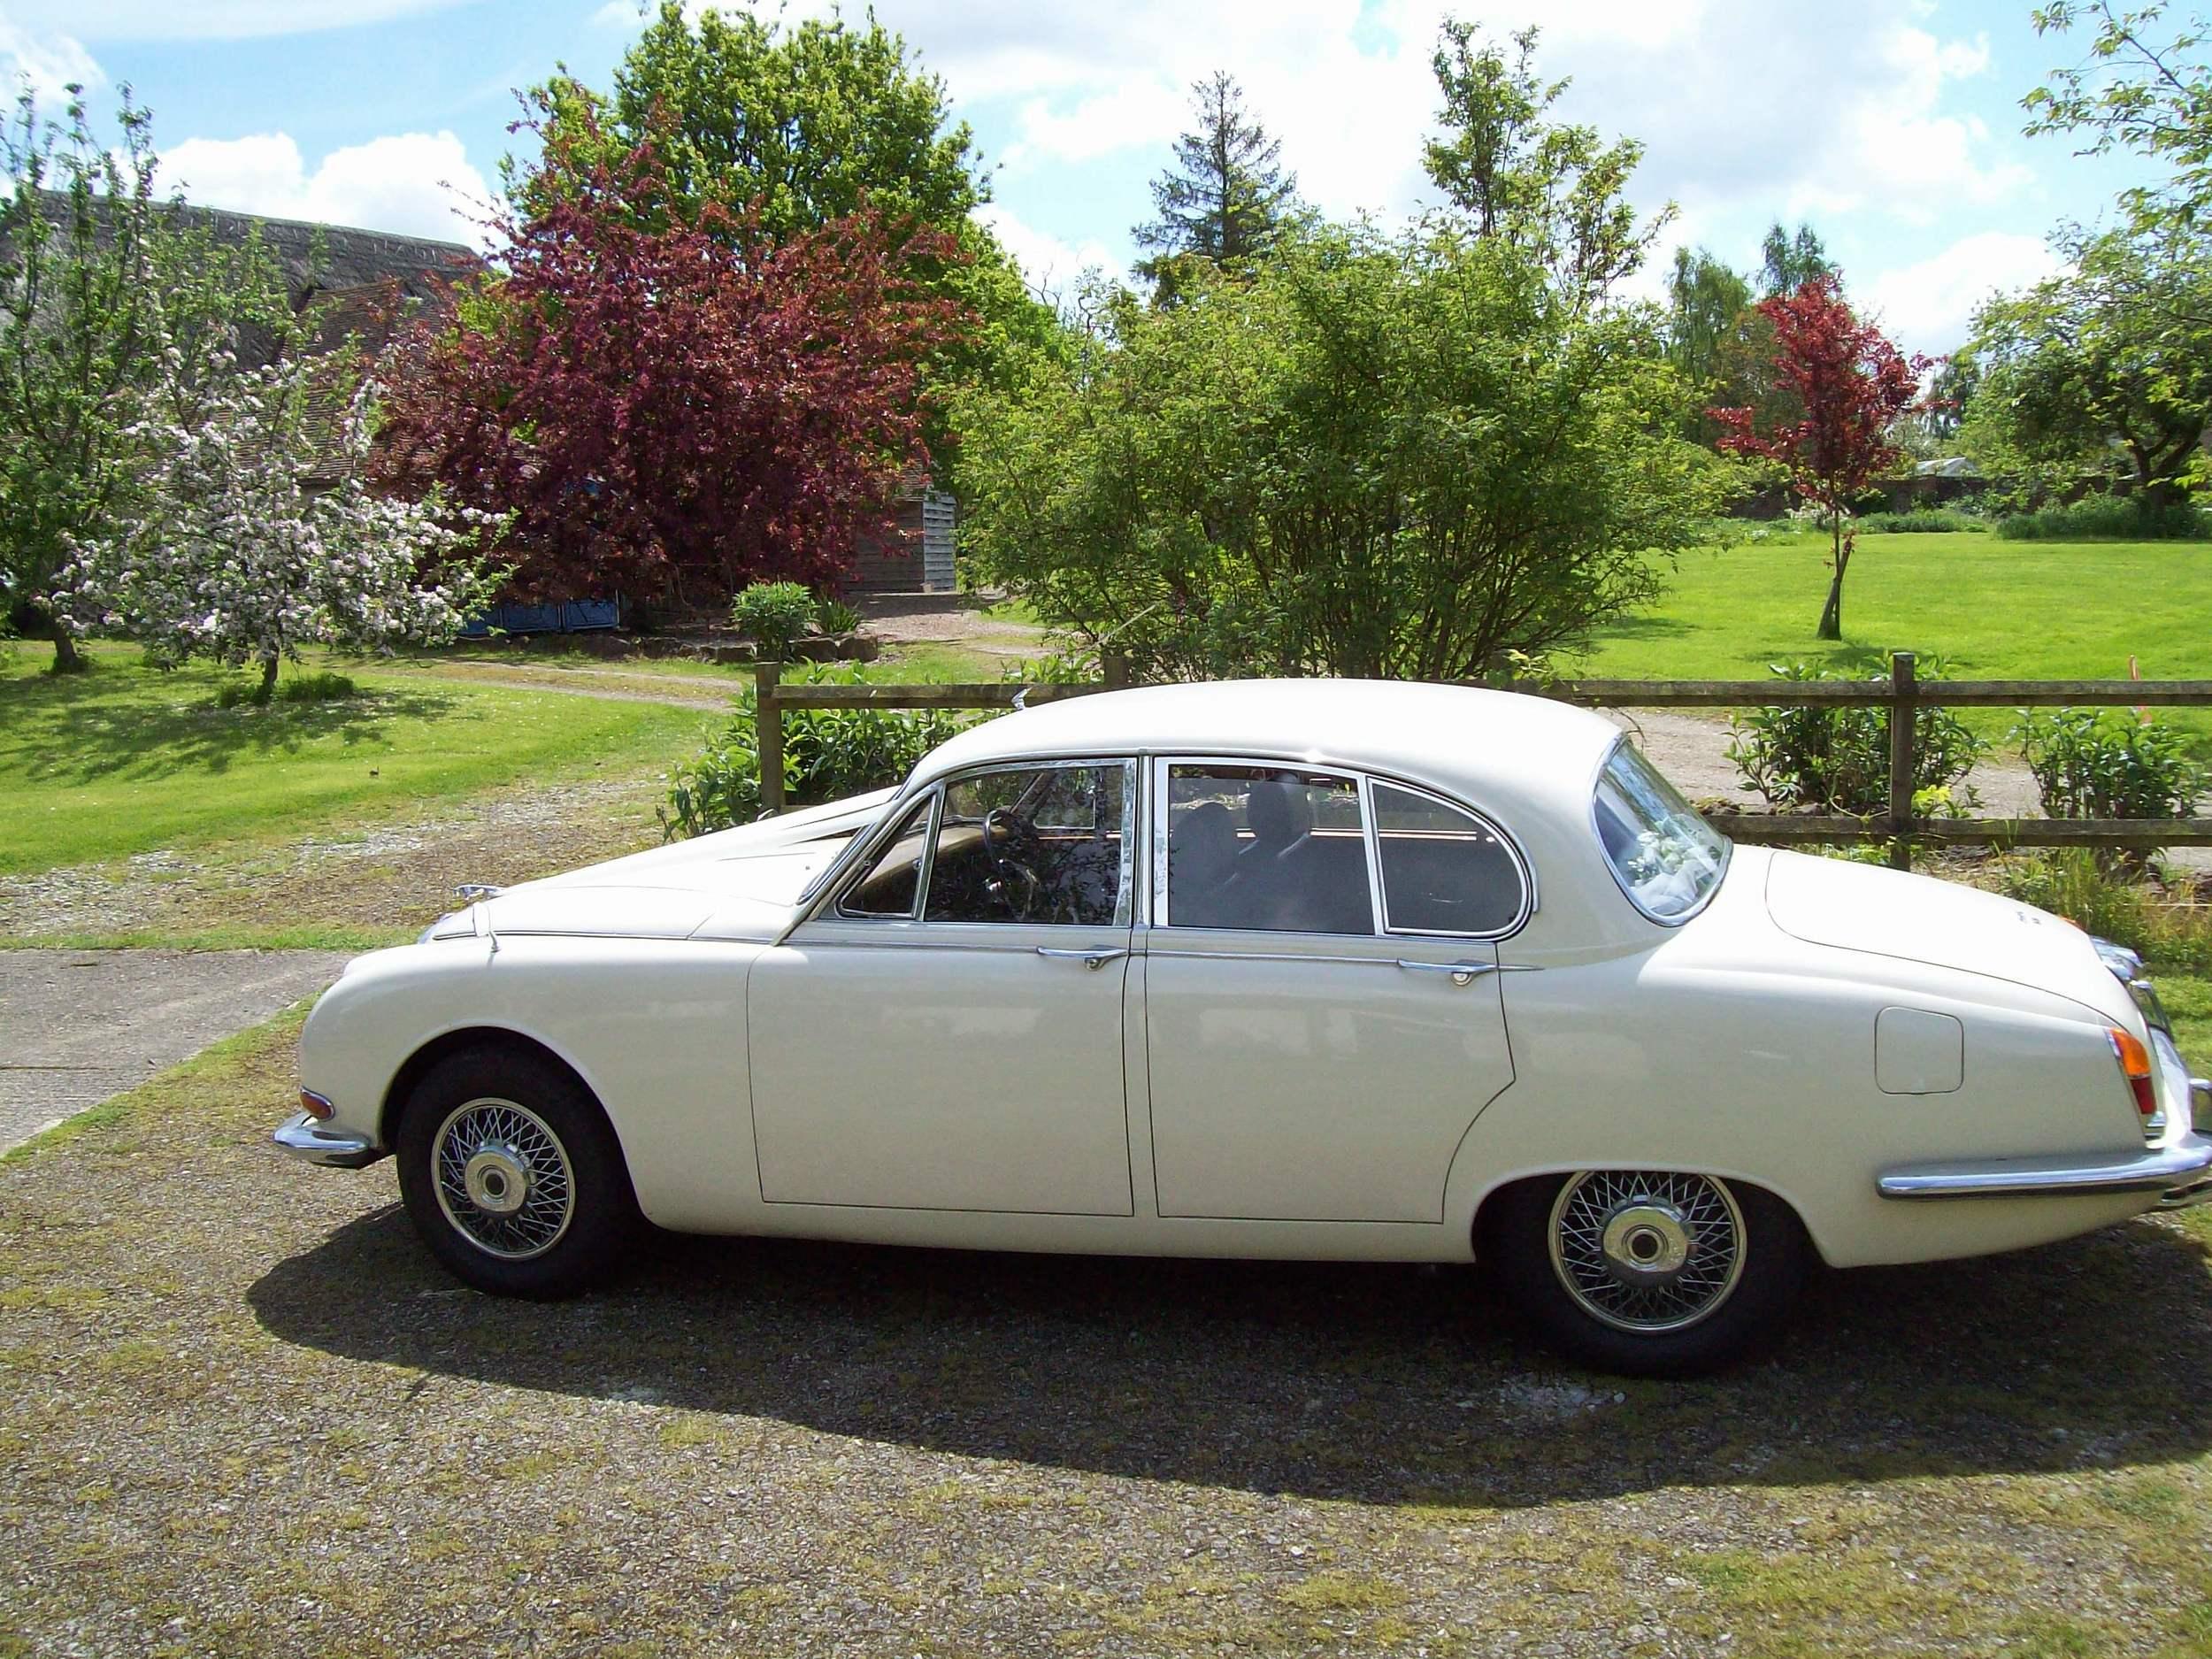 White Jaguar 'S' type